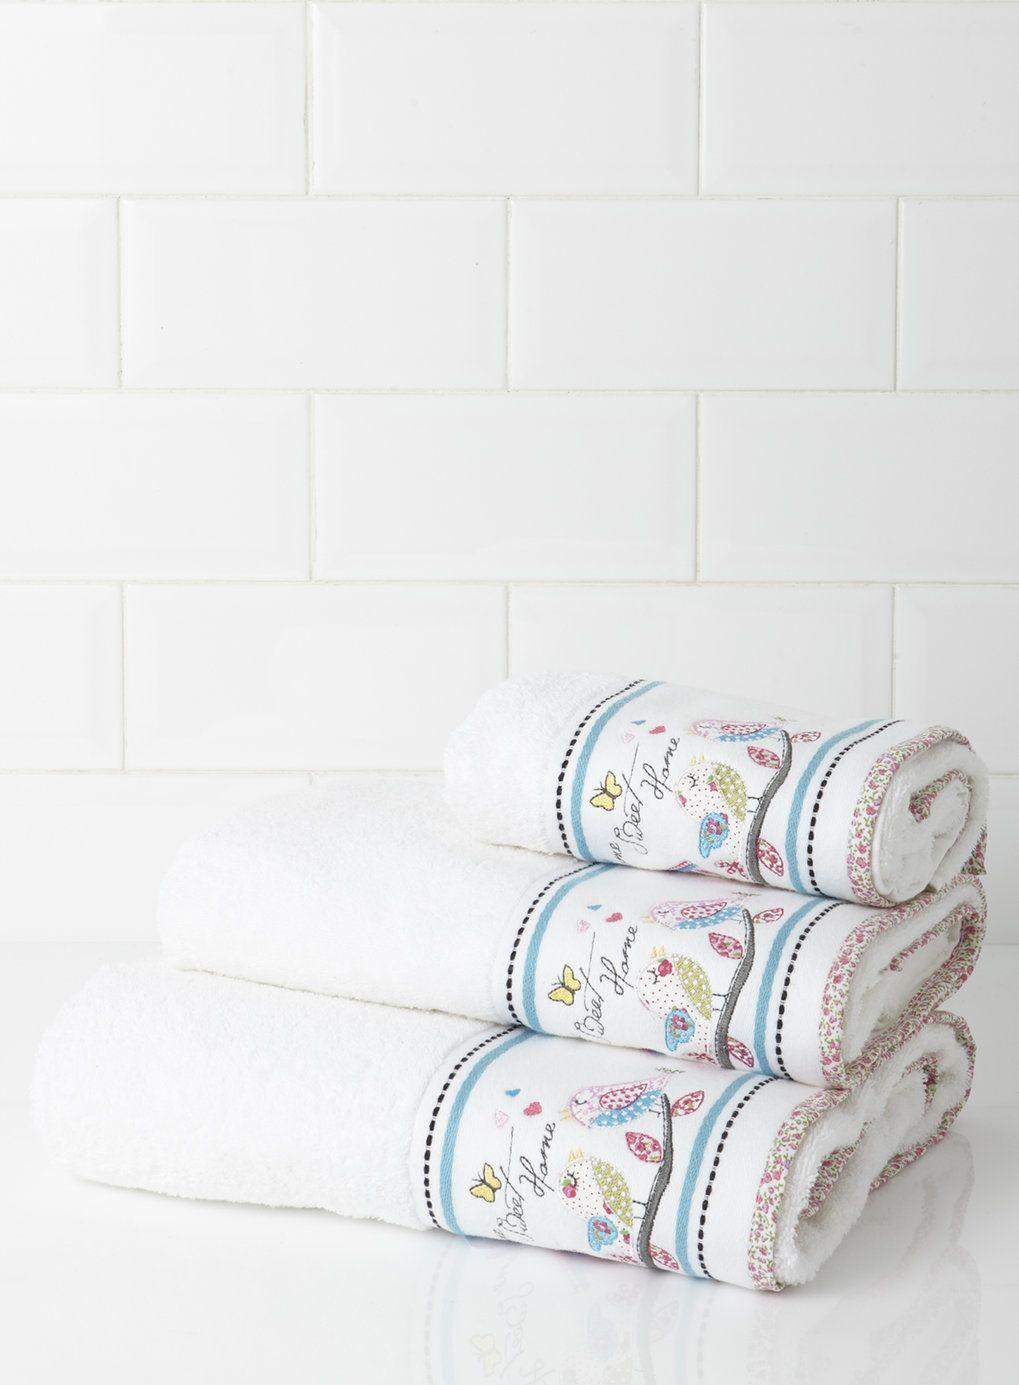 Home Sweet Home Applique Towel BHS Bathroom Pinterest - Bhs monochrome word bath sheet bhs monochrome word hand towel